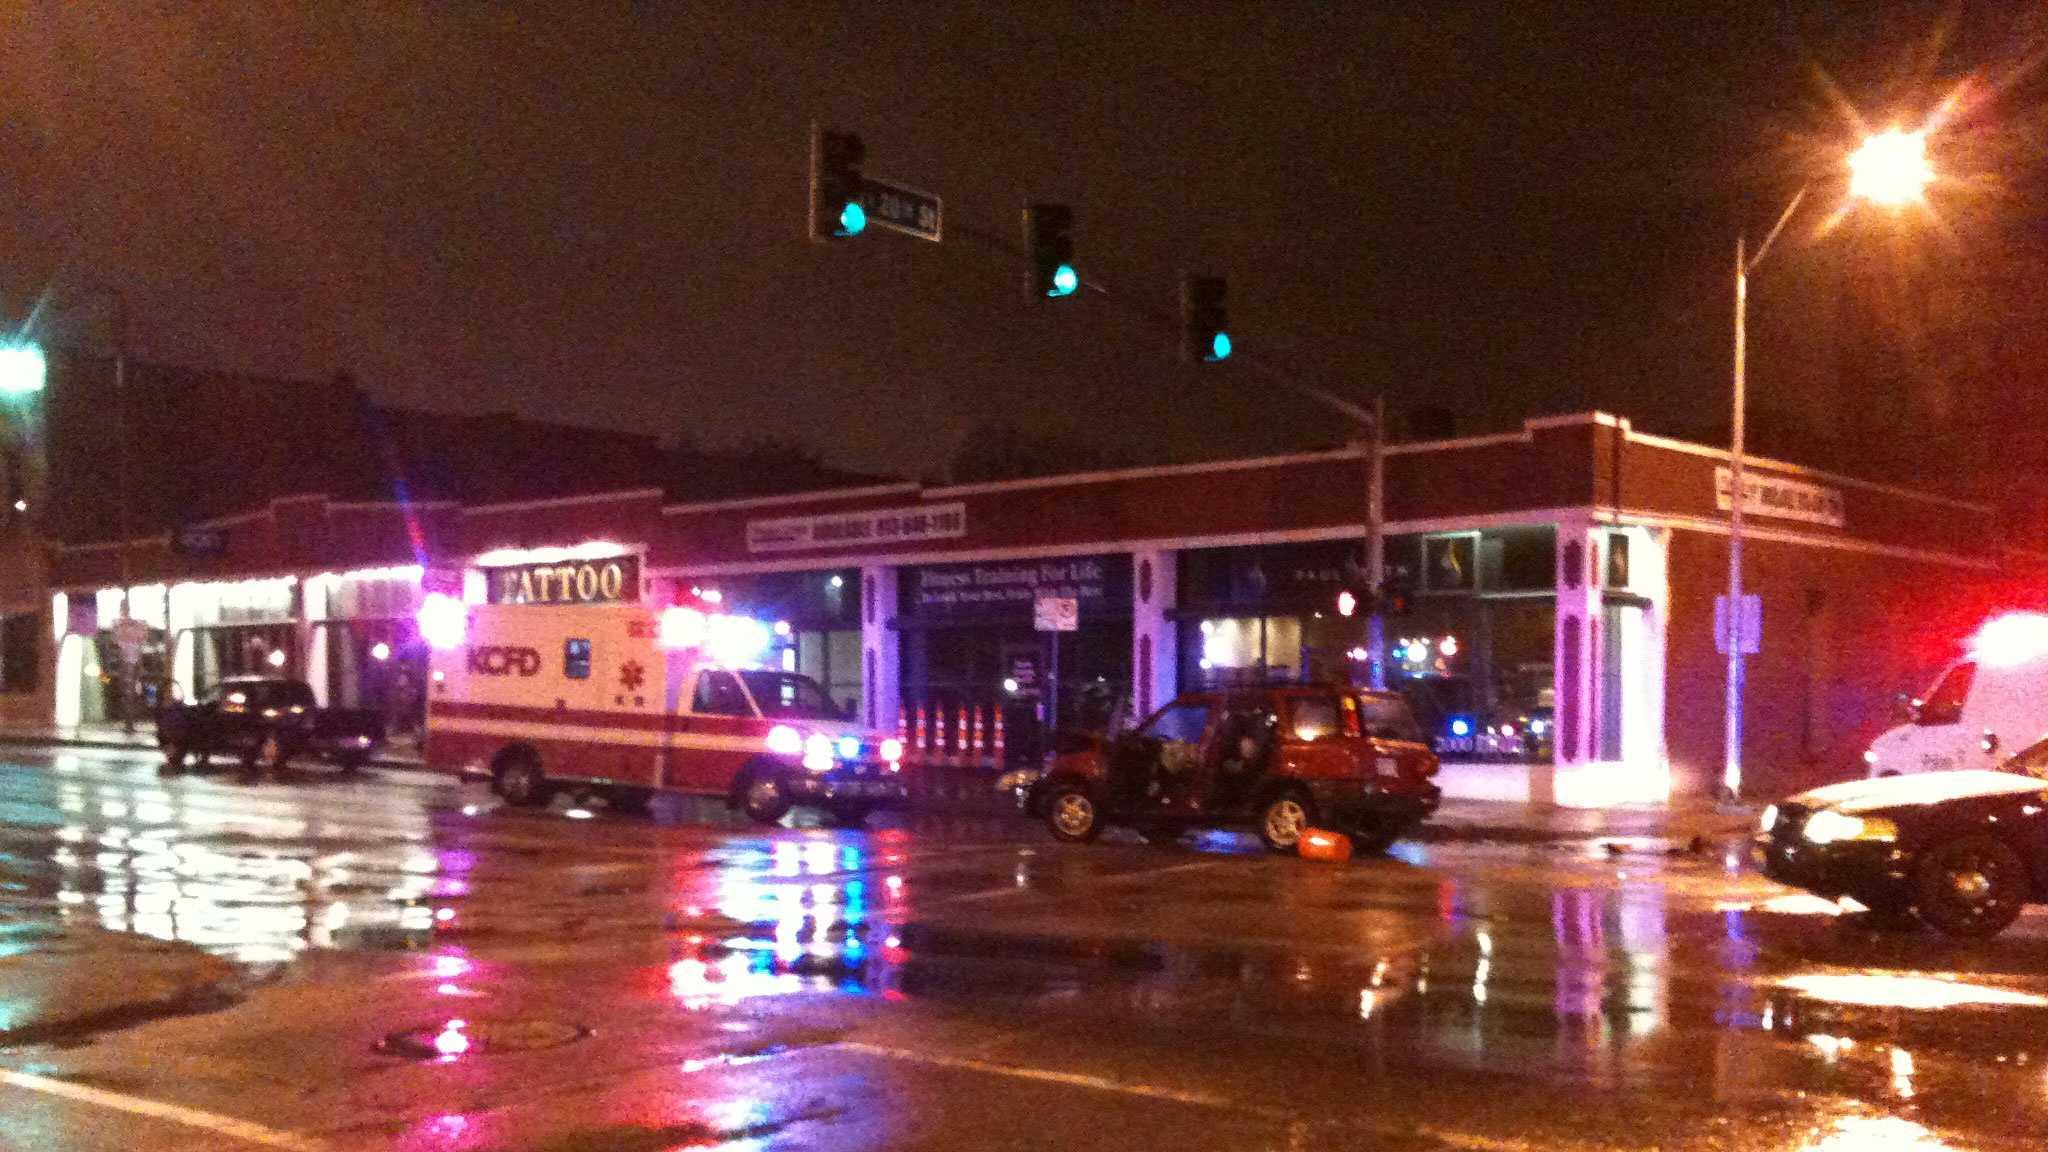 20th, Main car accident